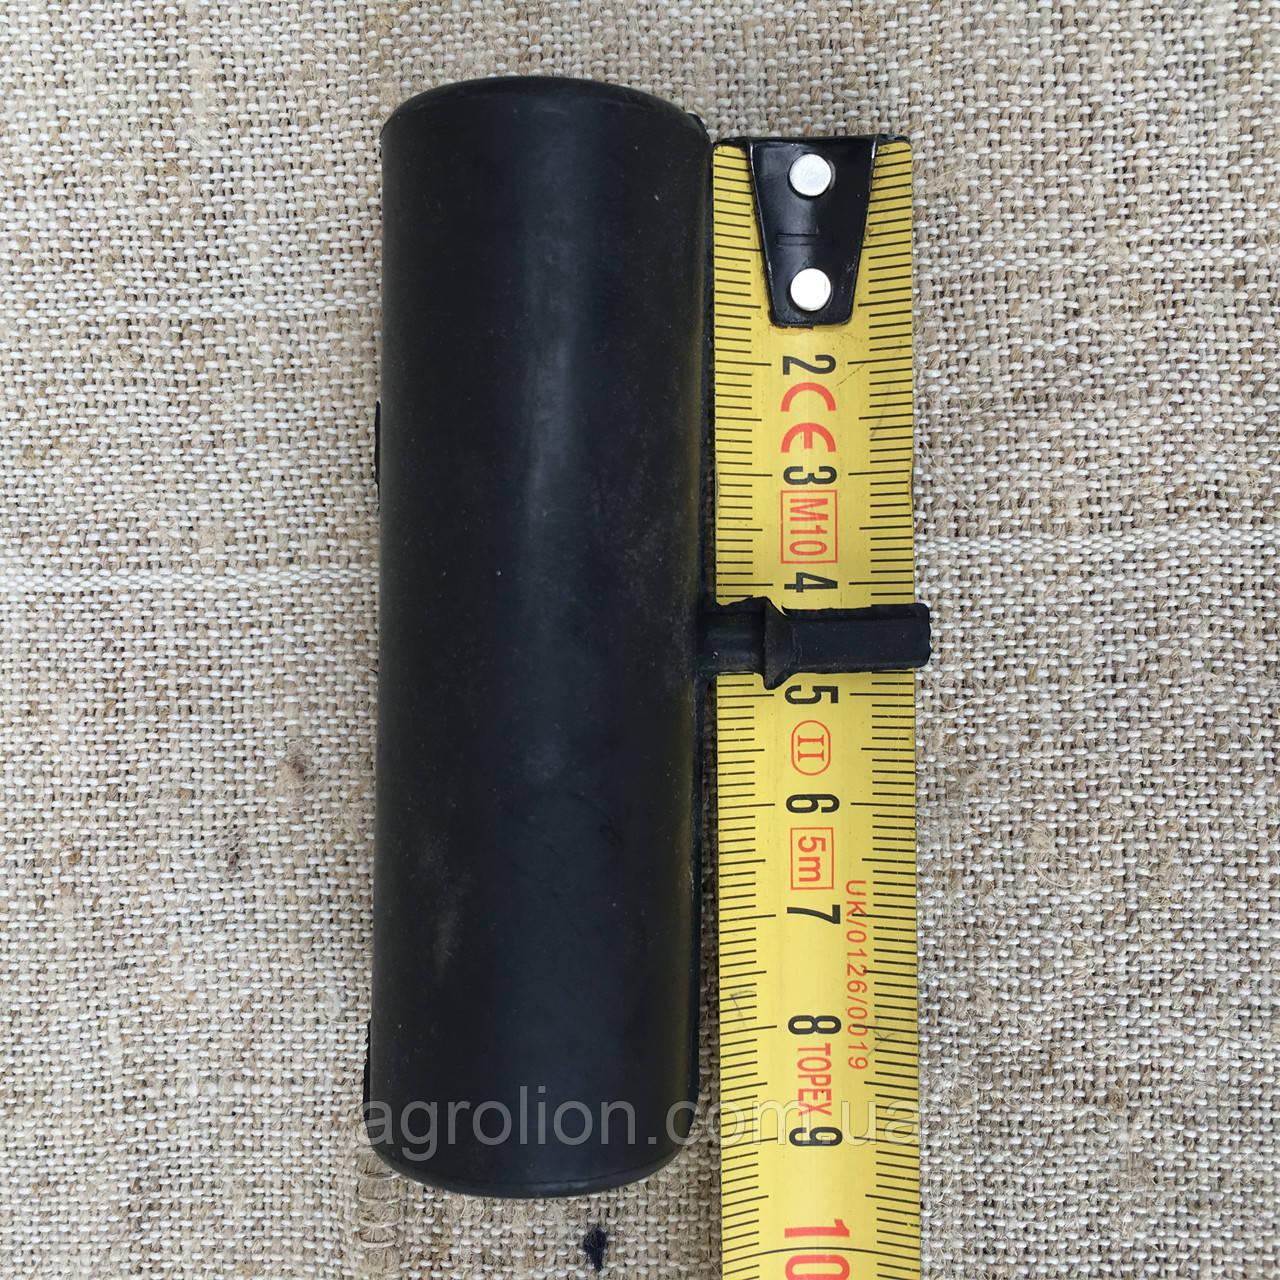 Амортизатор (Демпфер) Horsh 28×90 00200165